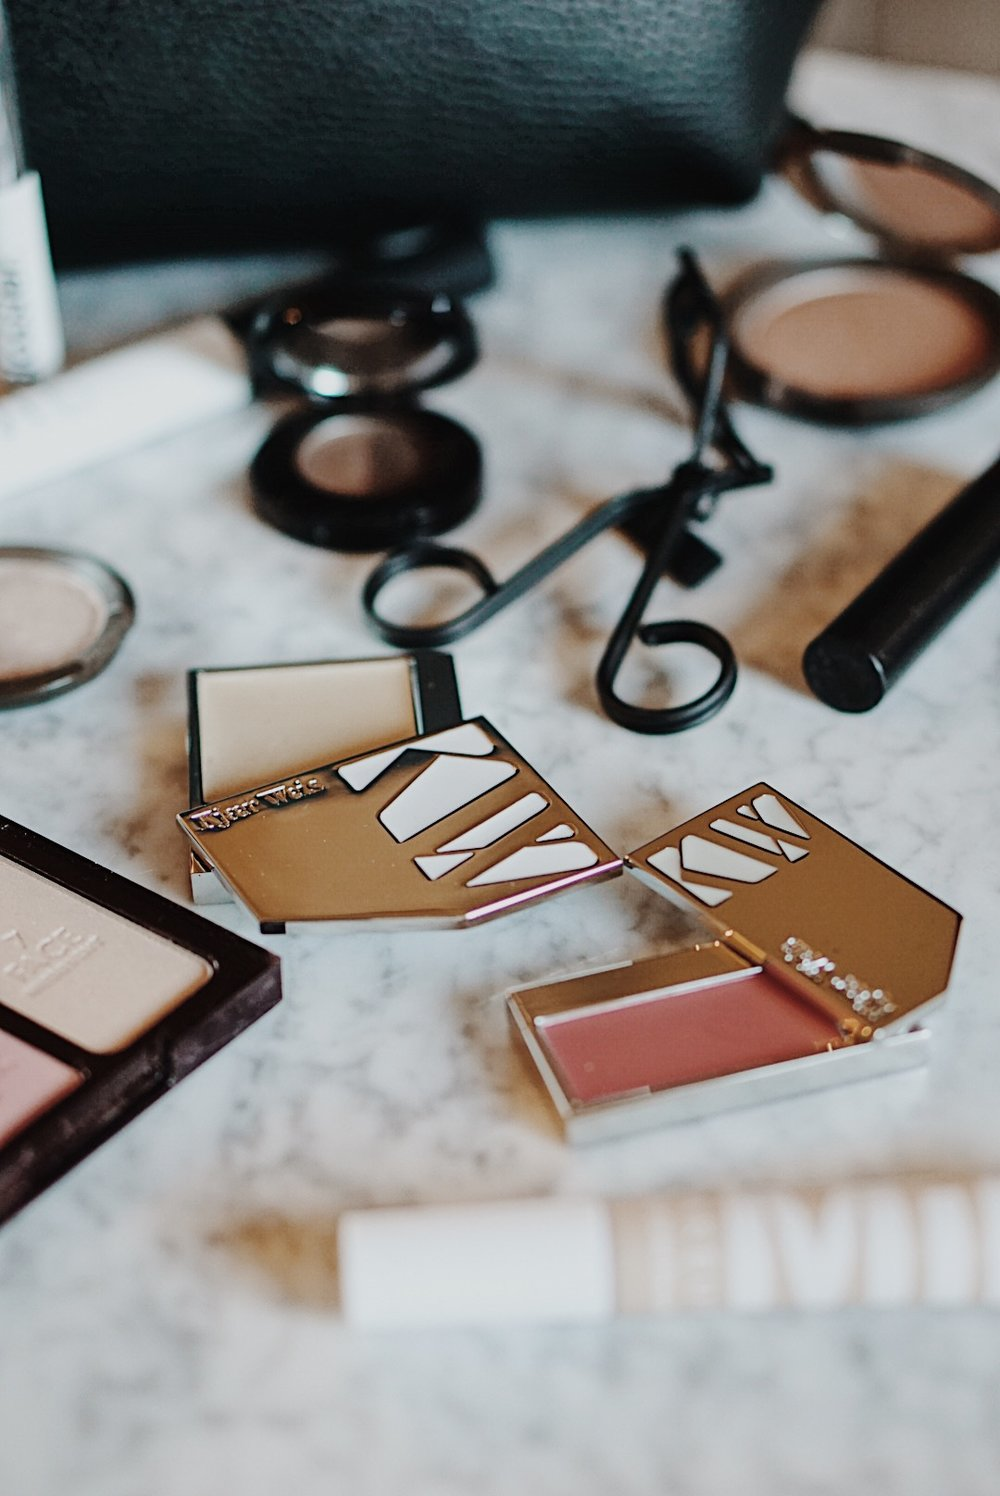 December Makeup Bag - Kjaer Weis